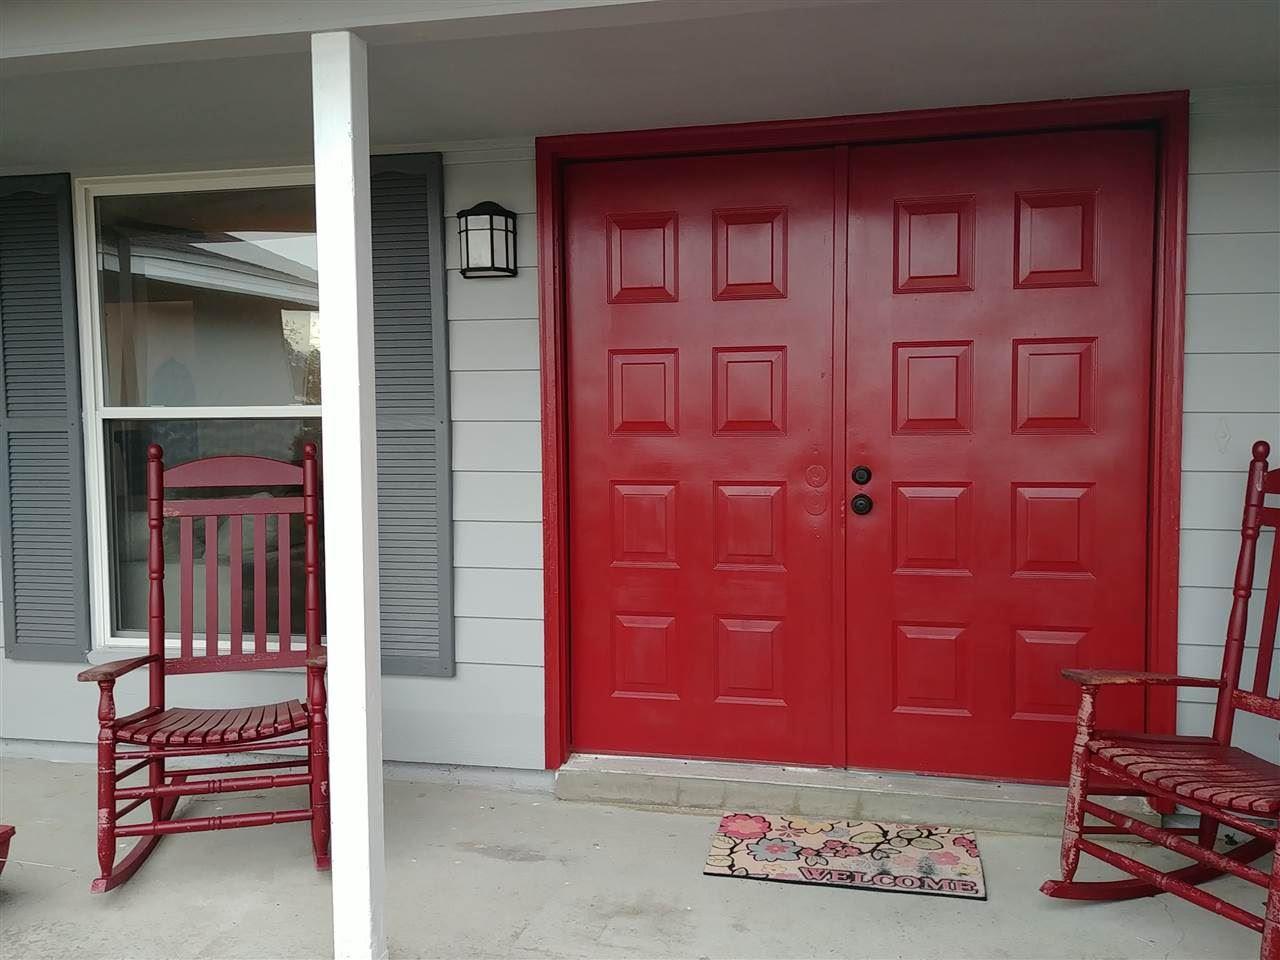 414 Malcolm Smith Road, Chattahoochee, FL 32324 - MLS#: 316742